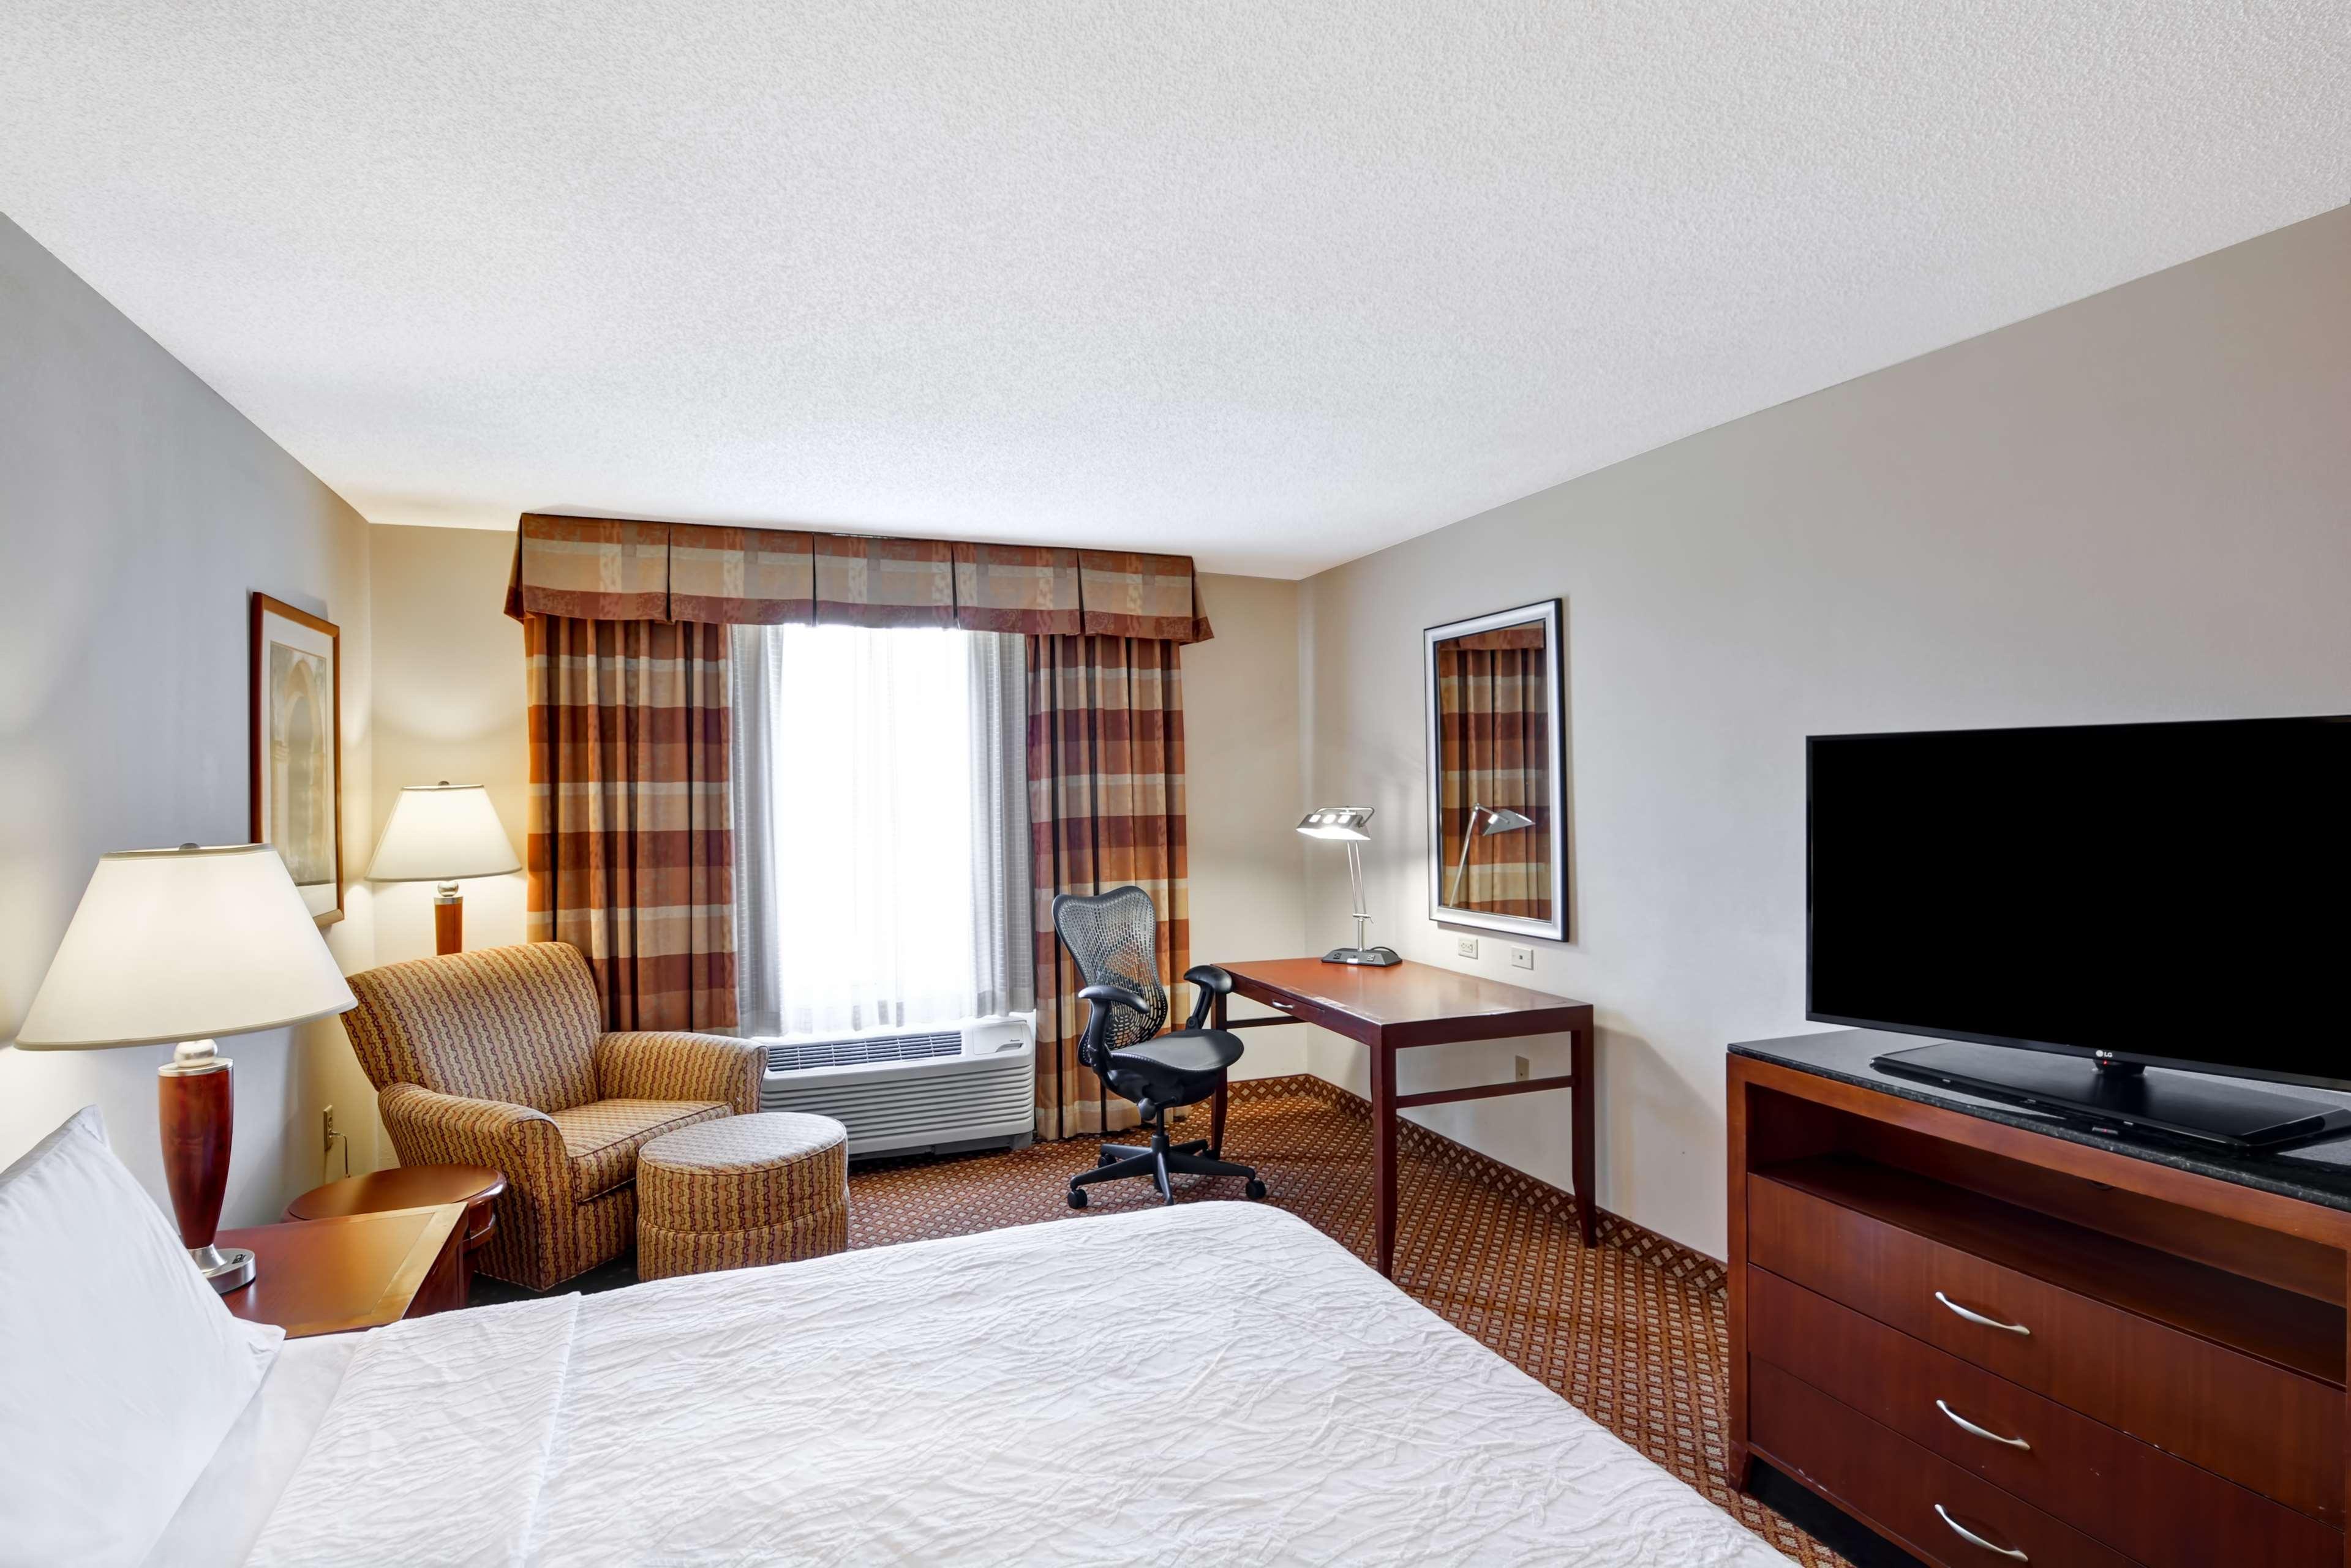 Hilton Garden Inn Panama City image 32